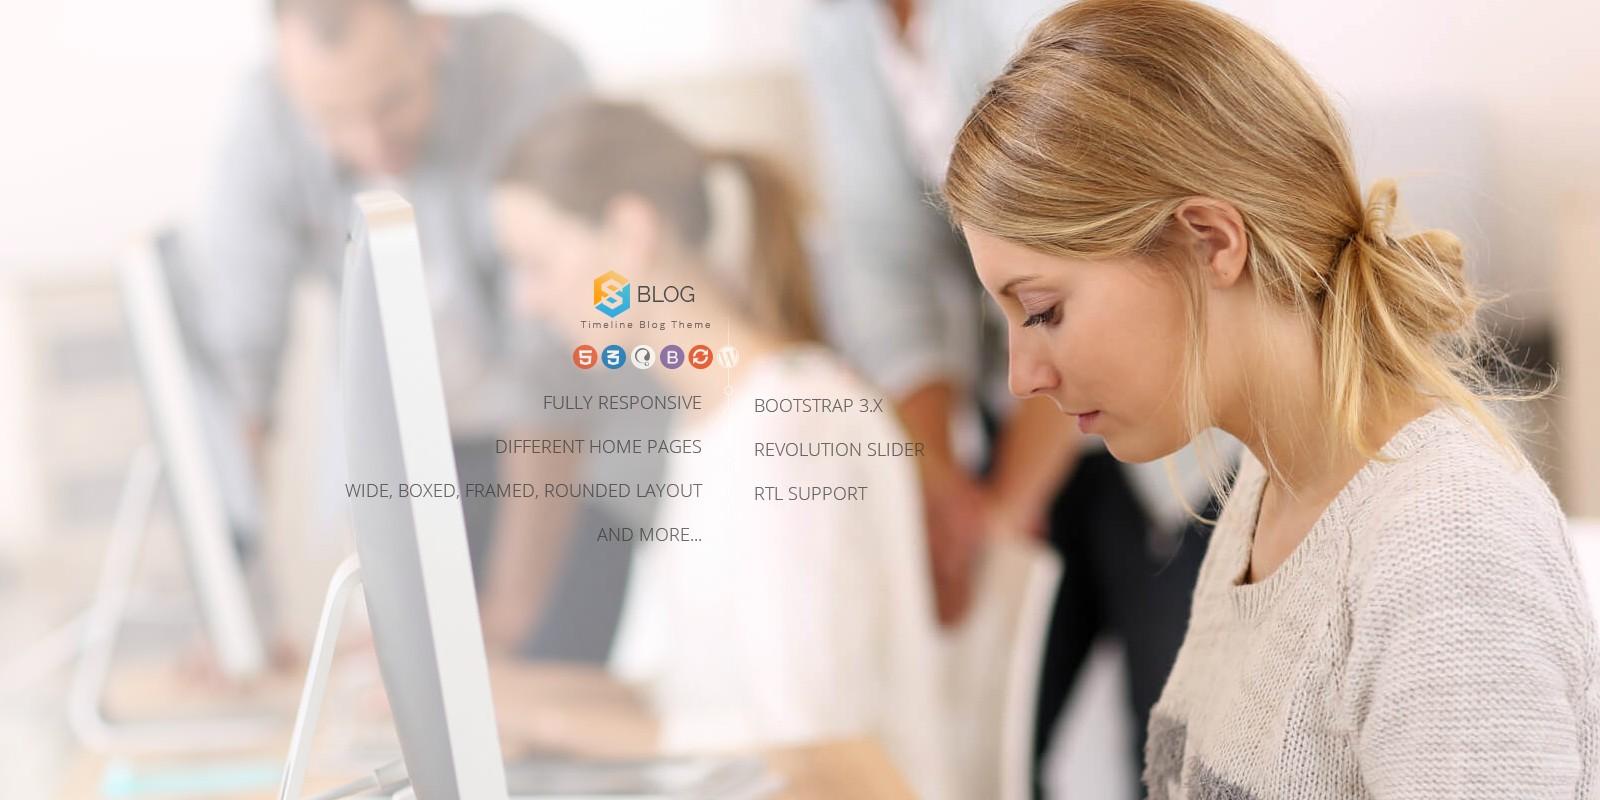 Jv Blog - Responsive WordPress Theme